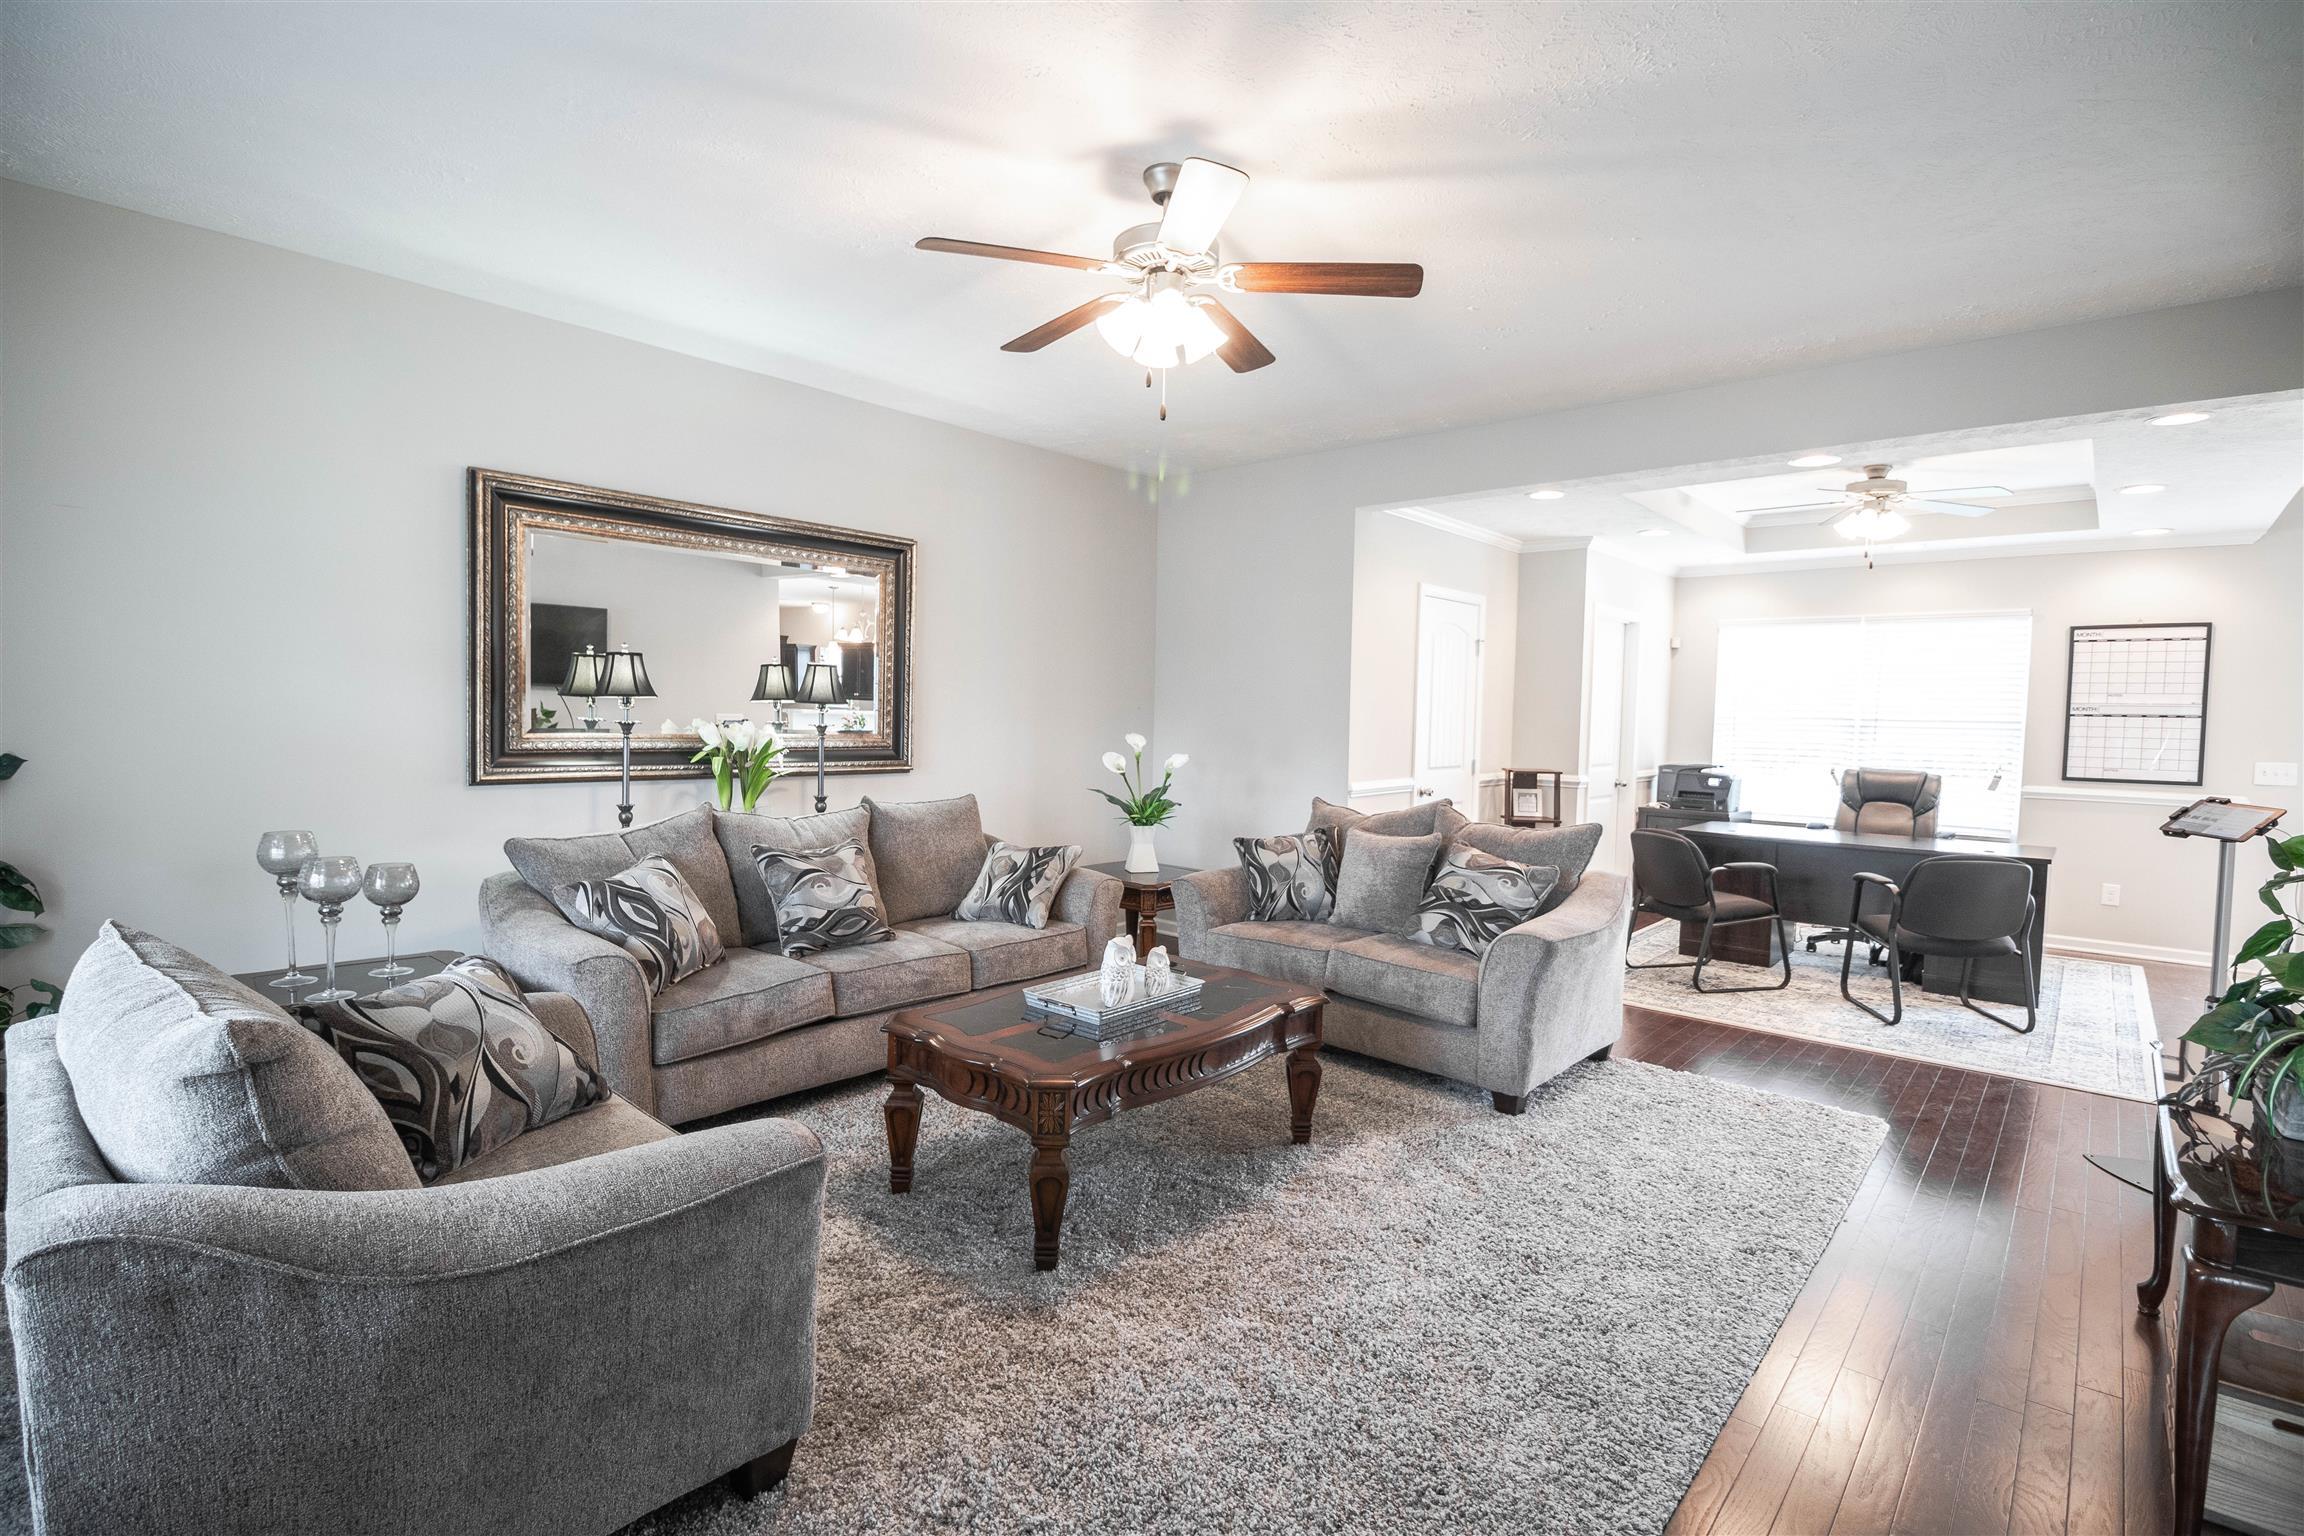 1009 Kalman Minuskin Blvd., LA VERGNE, TN 37086 - LA VERGNE, TN real estate listing